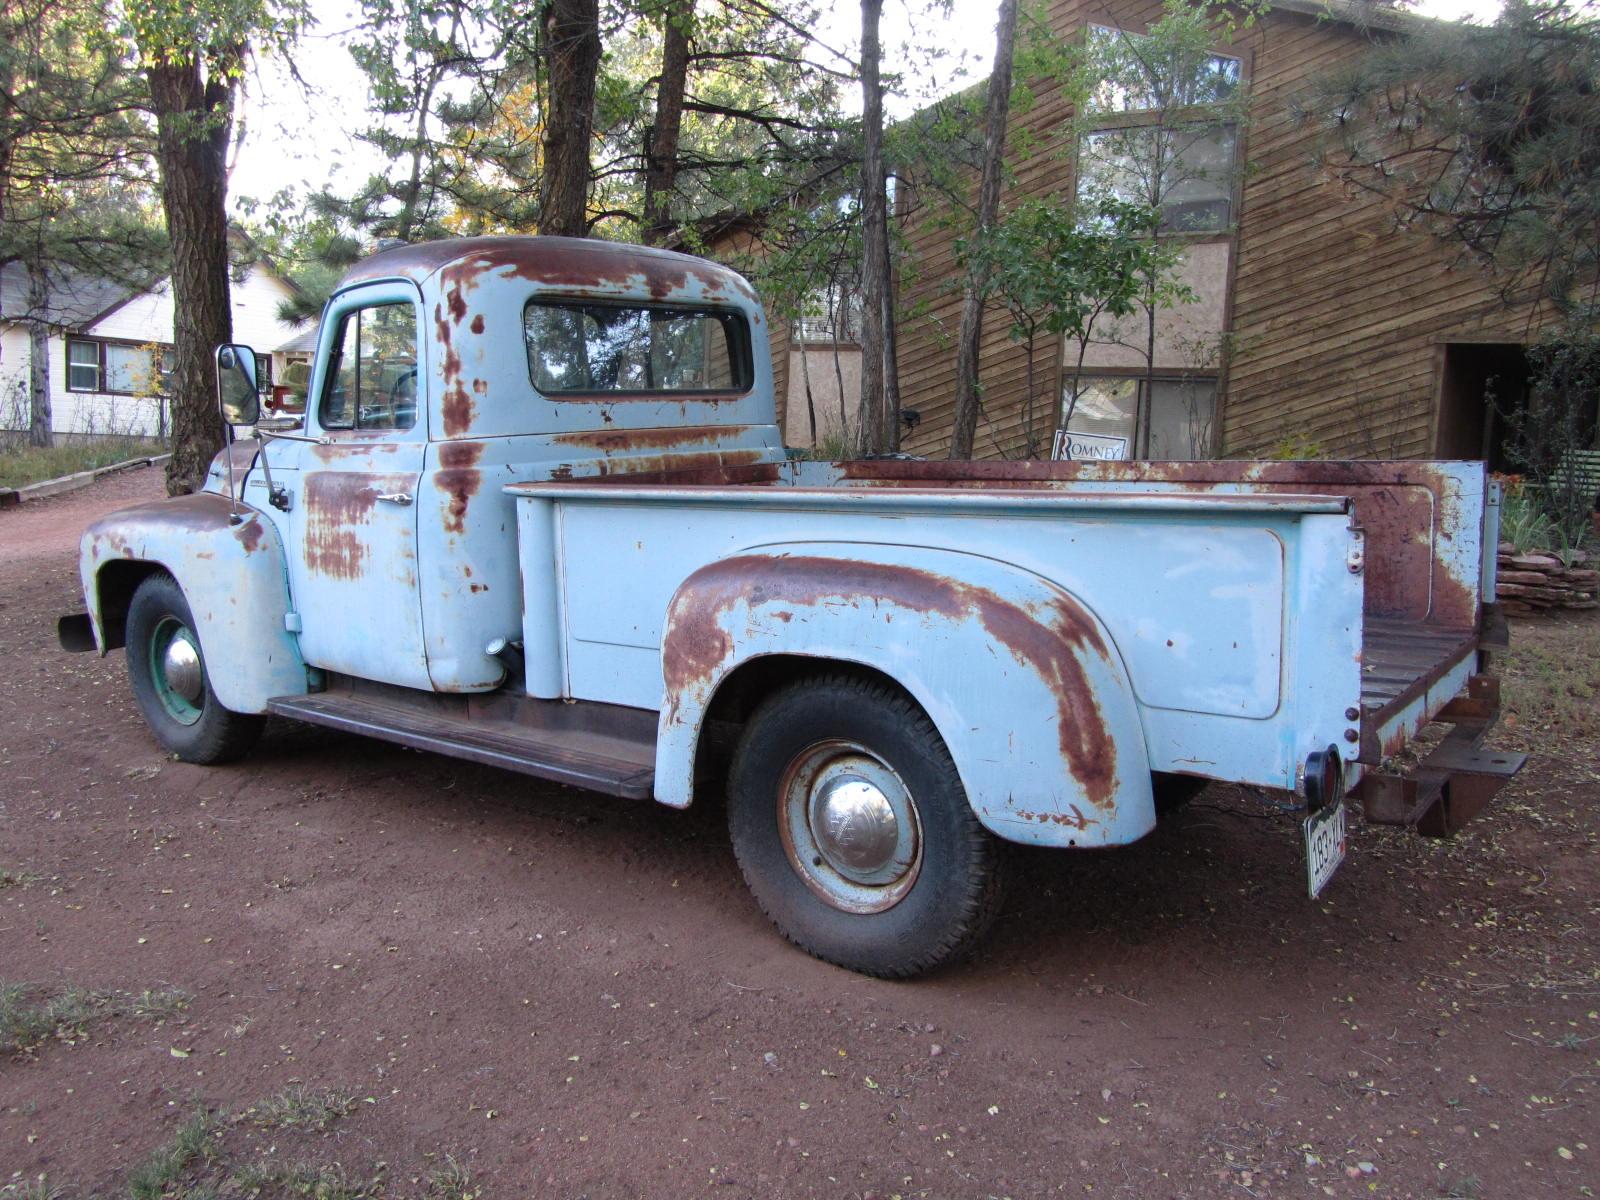 autoliterate: 1953 International pickup & American landscapes